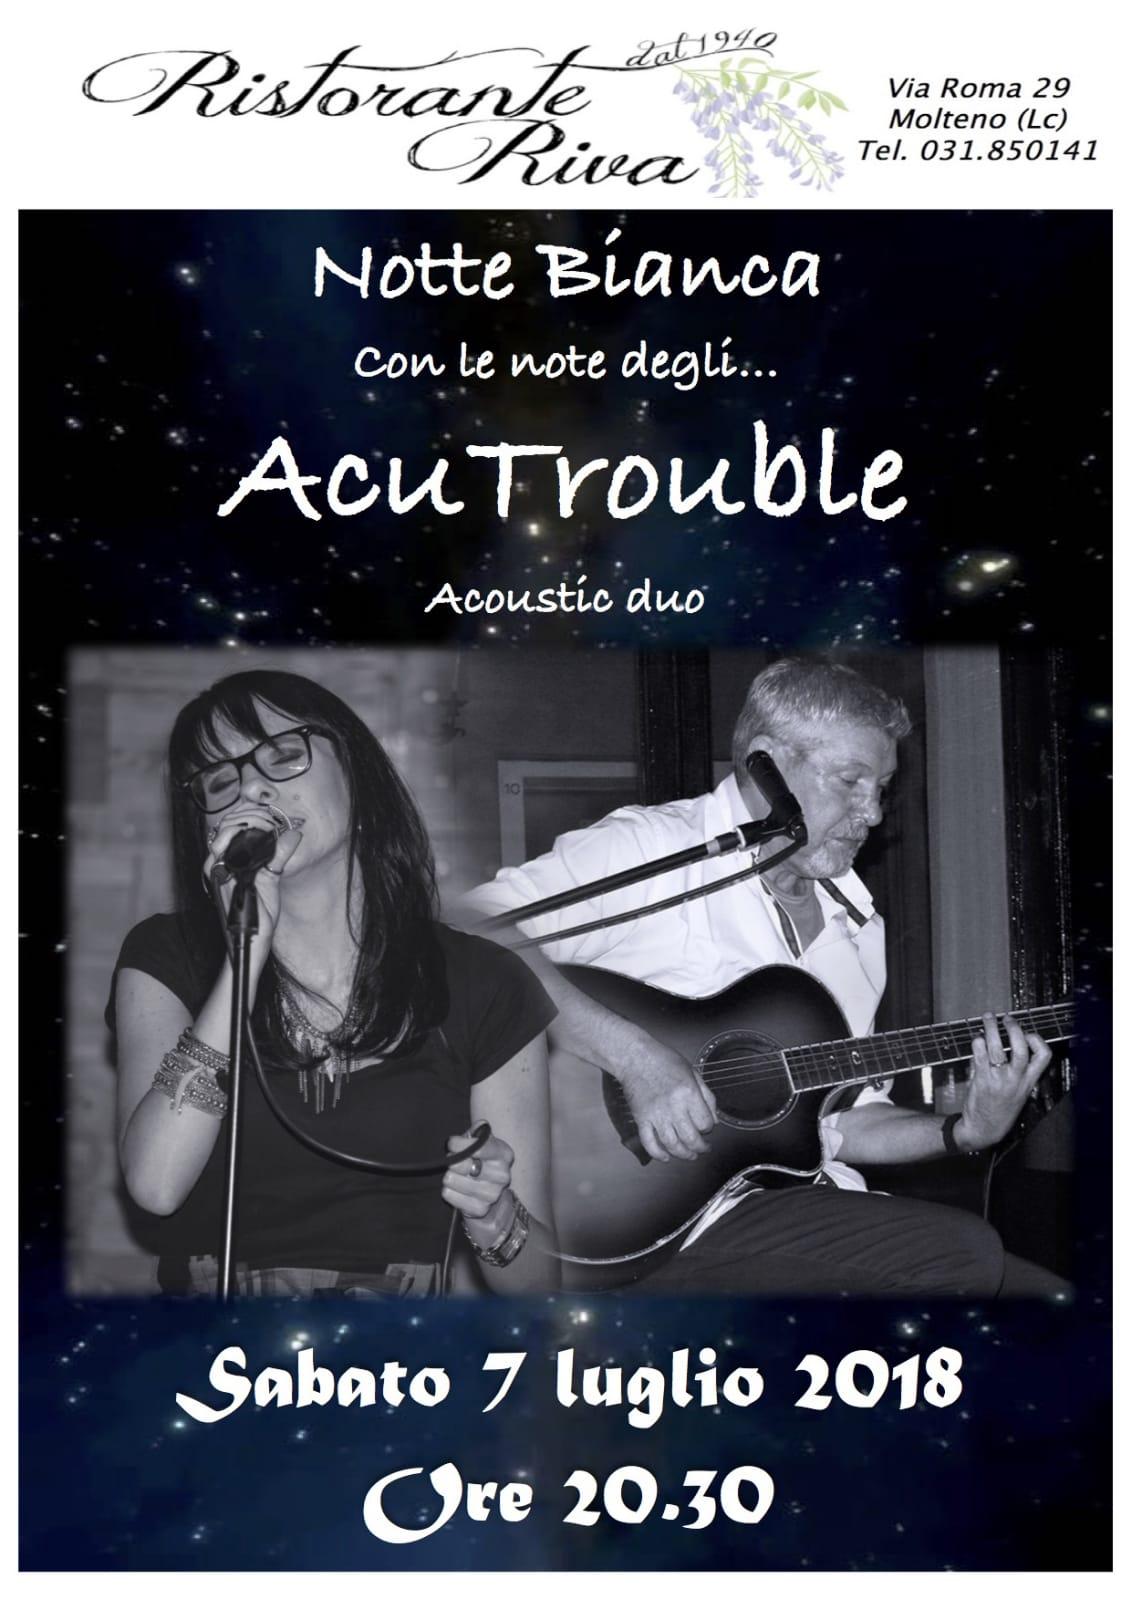 NOTTE_BIANCA_MOLTENO